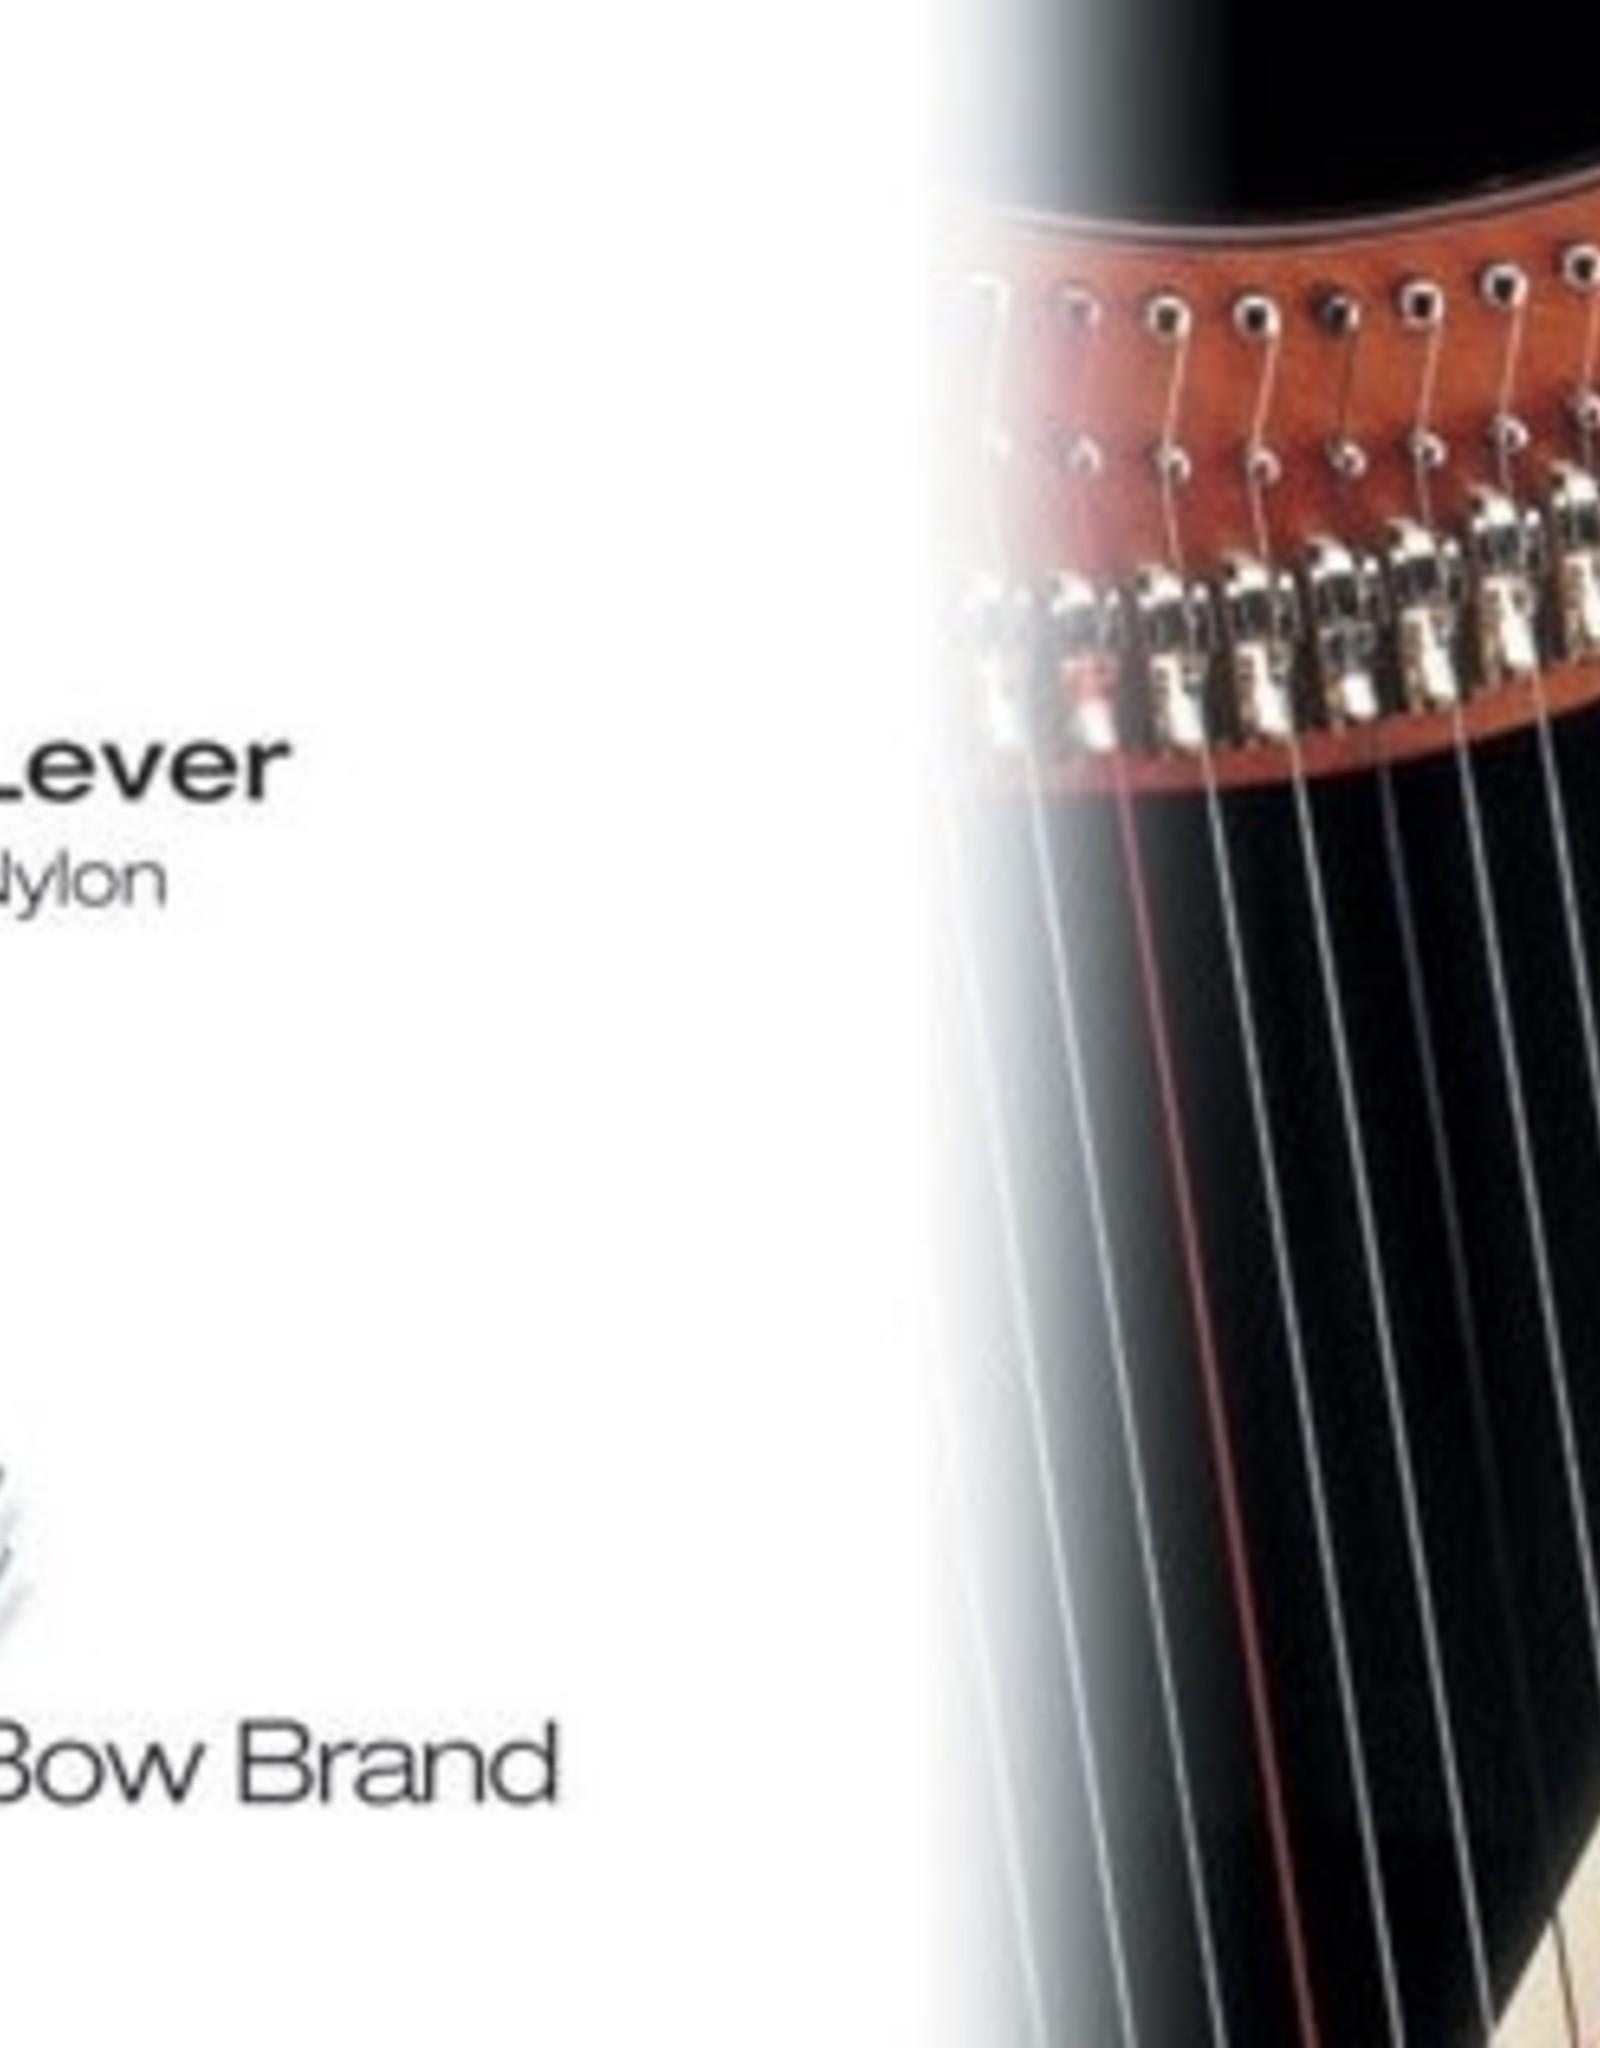 BOW BRAND  klep nylon - lever NYLON 21/3 fa